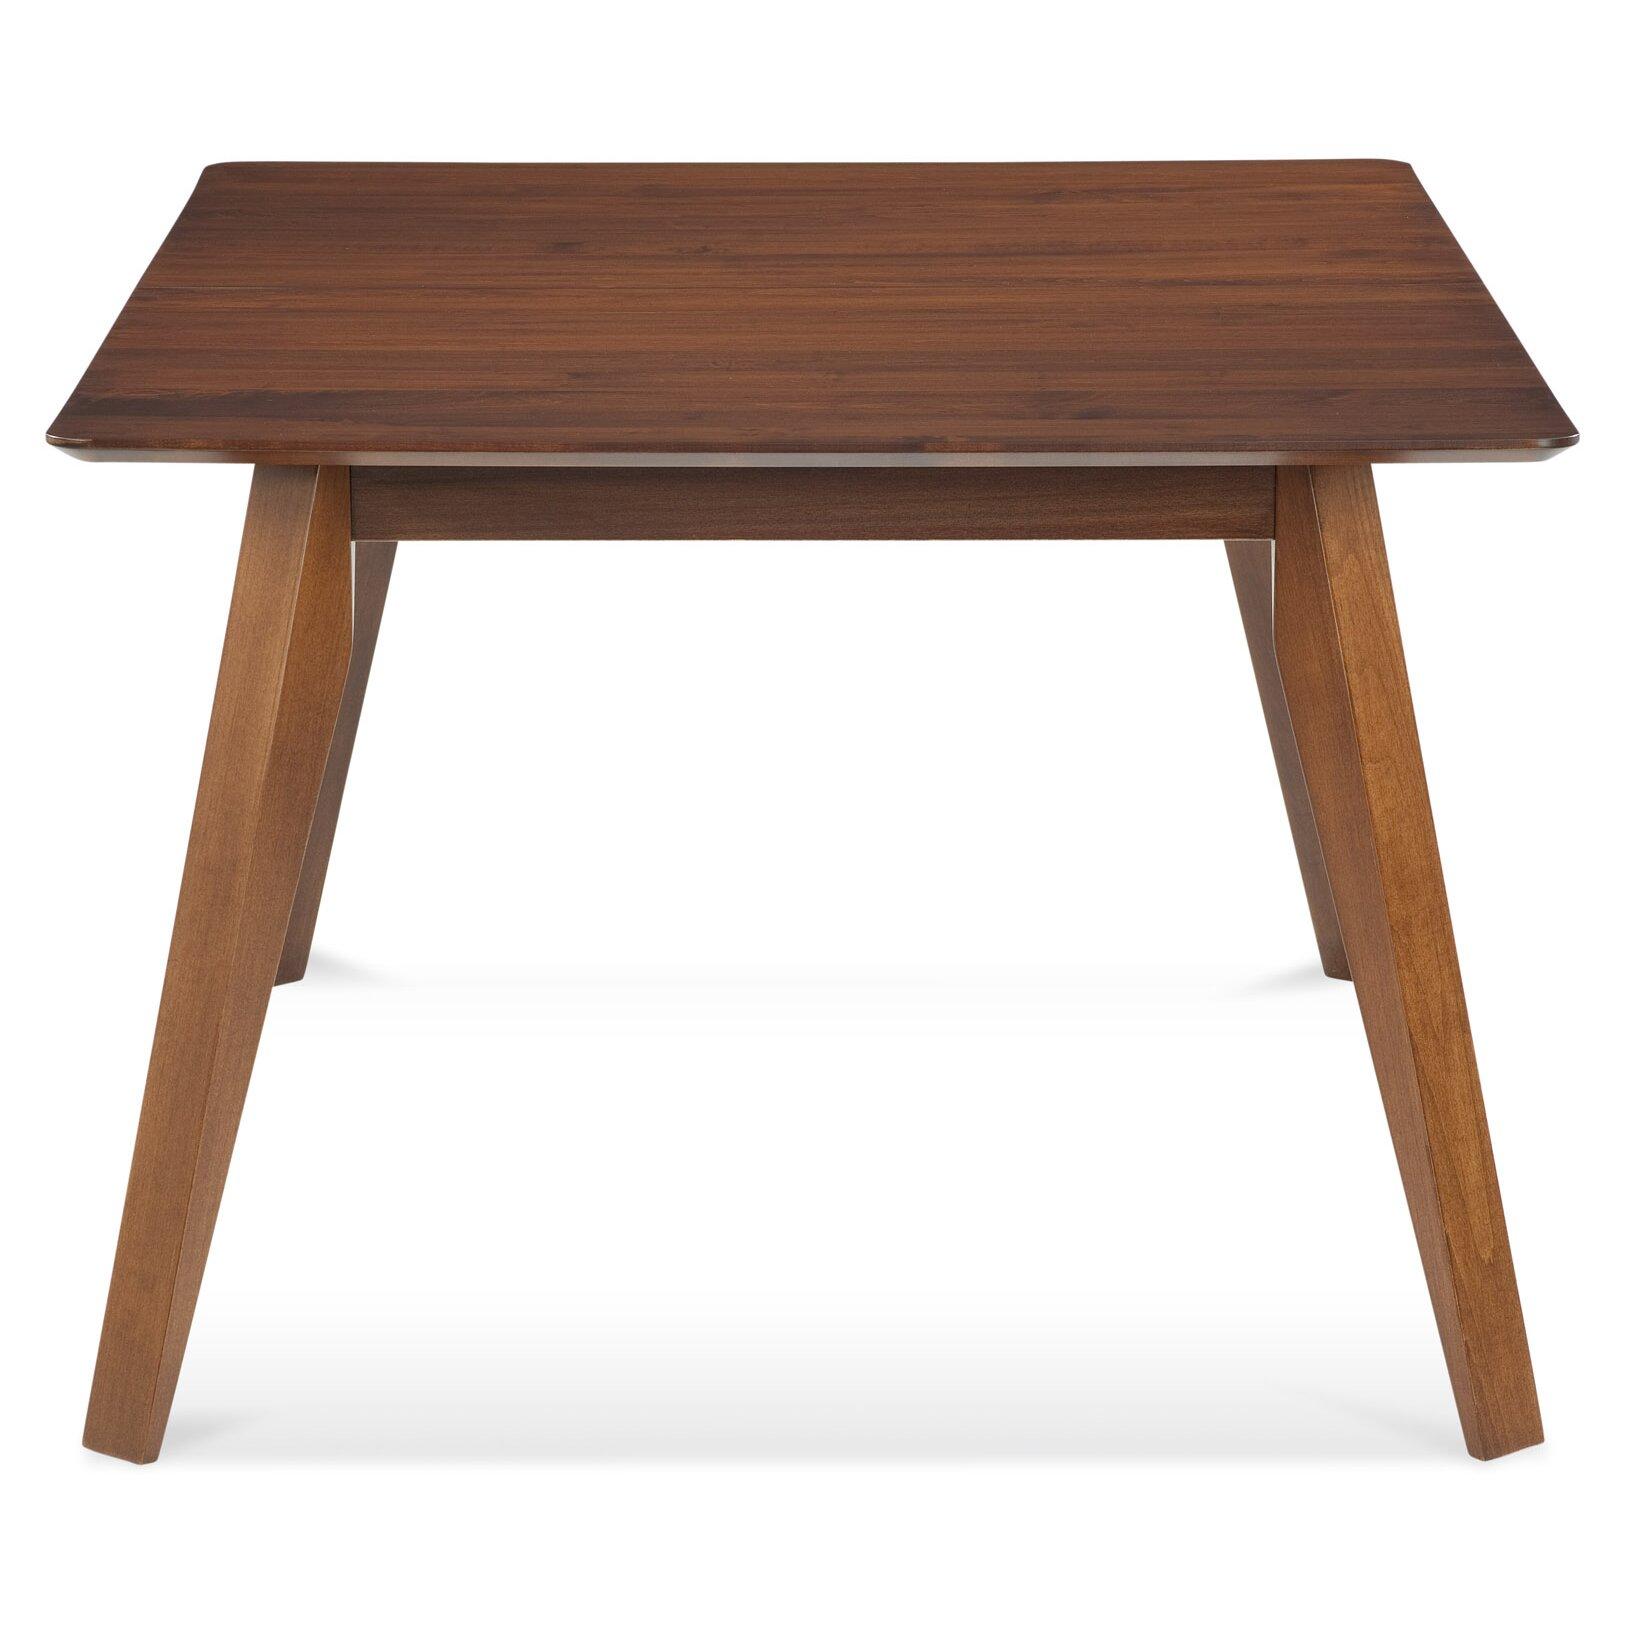 Saloom Furniture Spectra Dining Table Wayfair